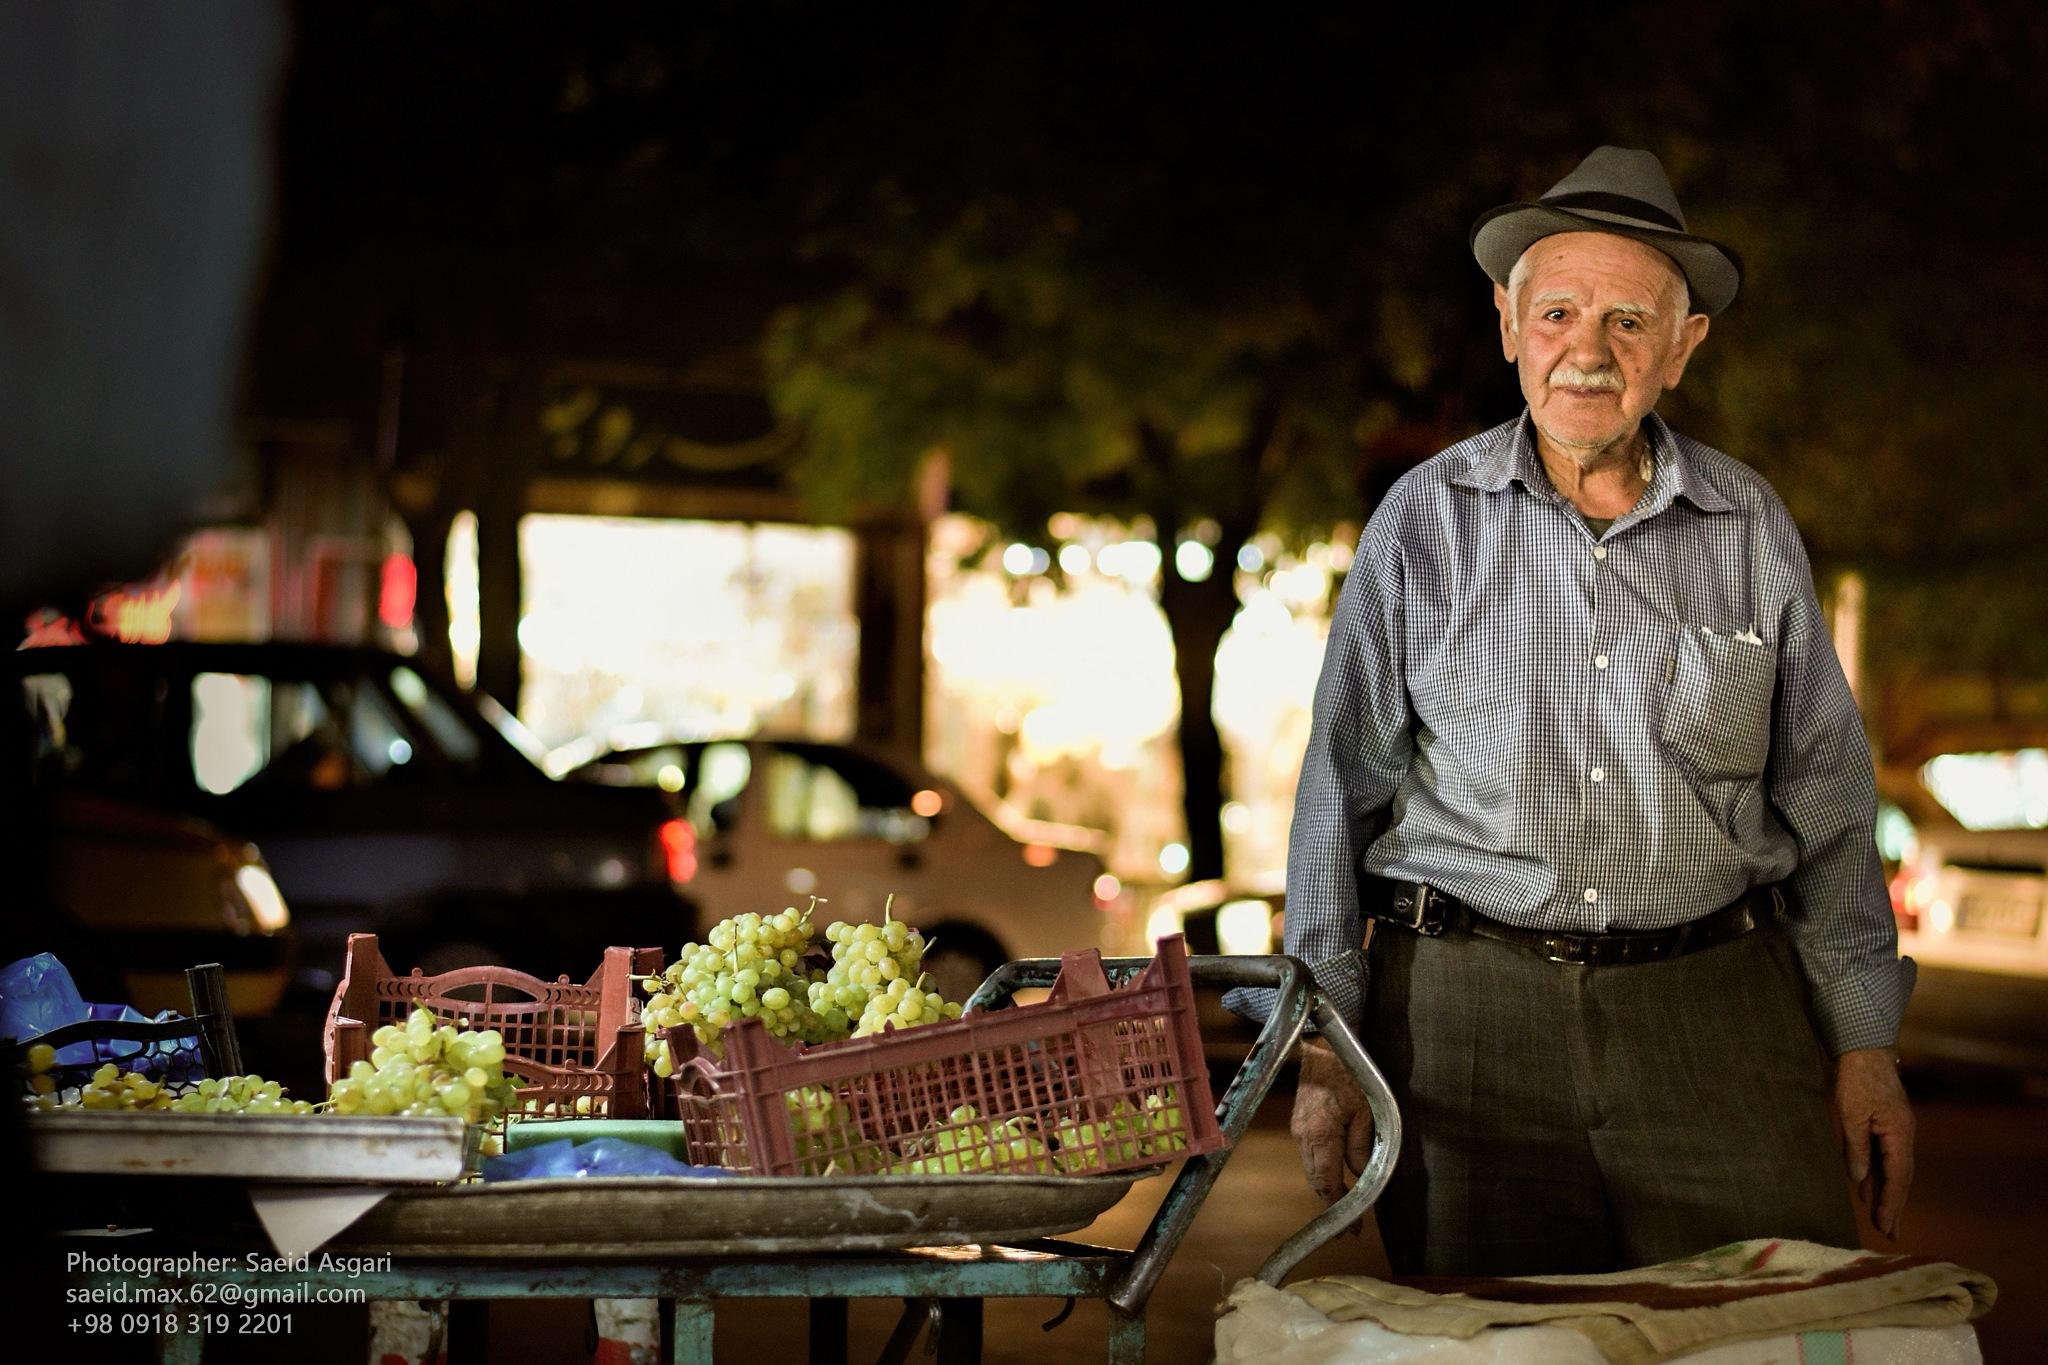 The Old man grapes seller... by Saeid_Asgari